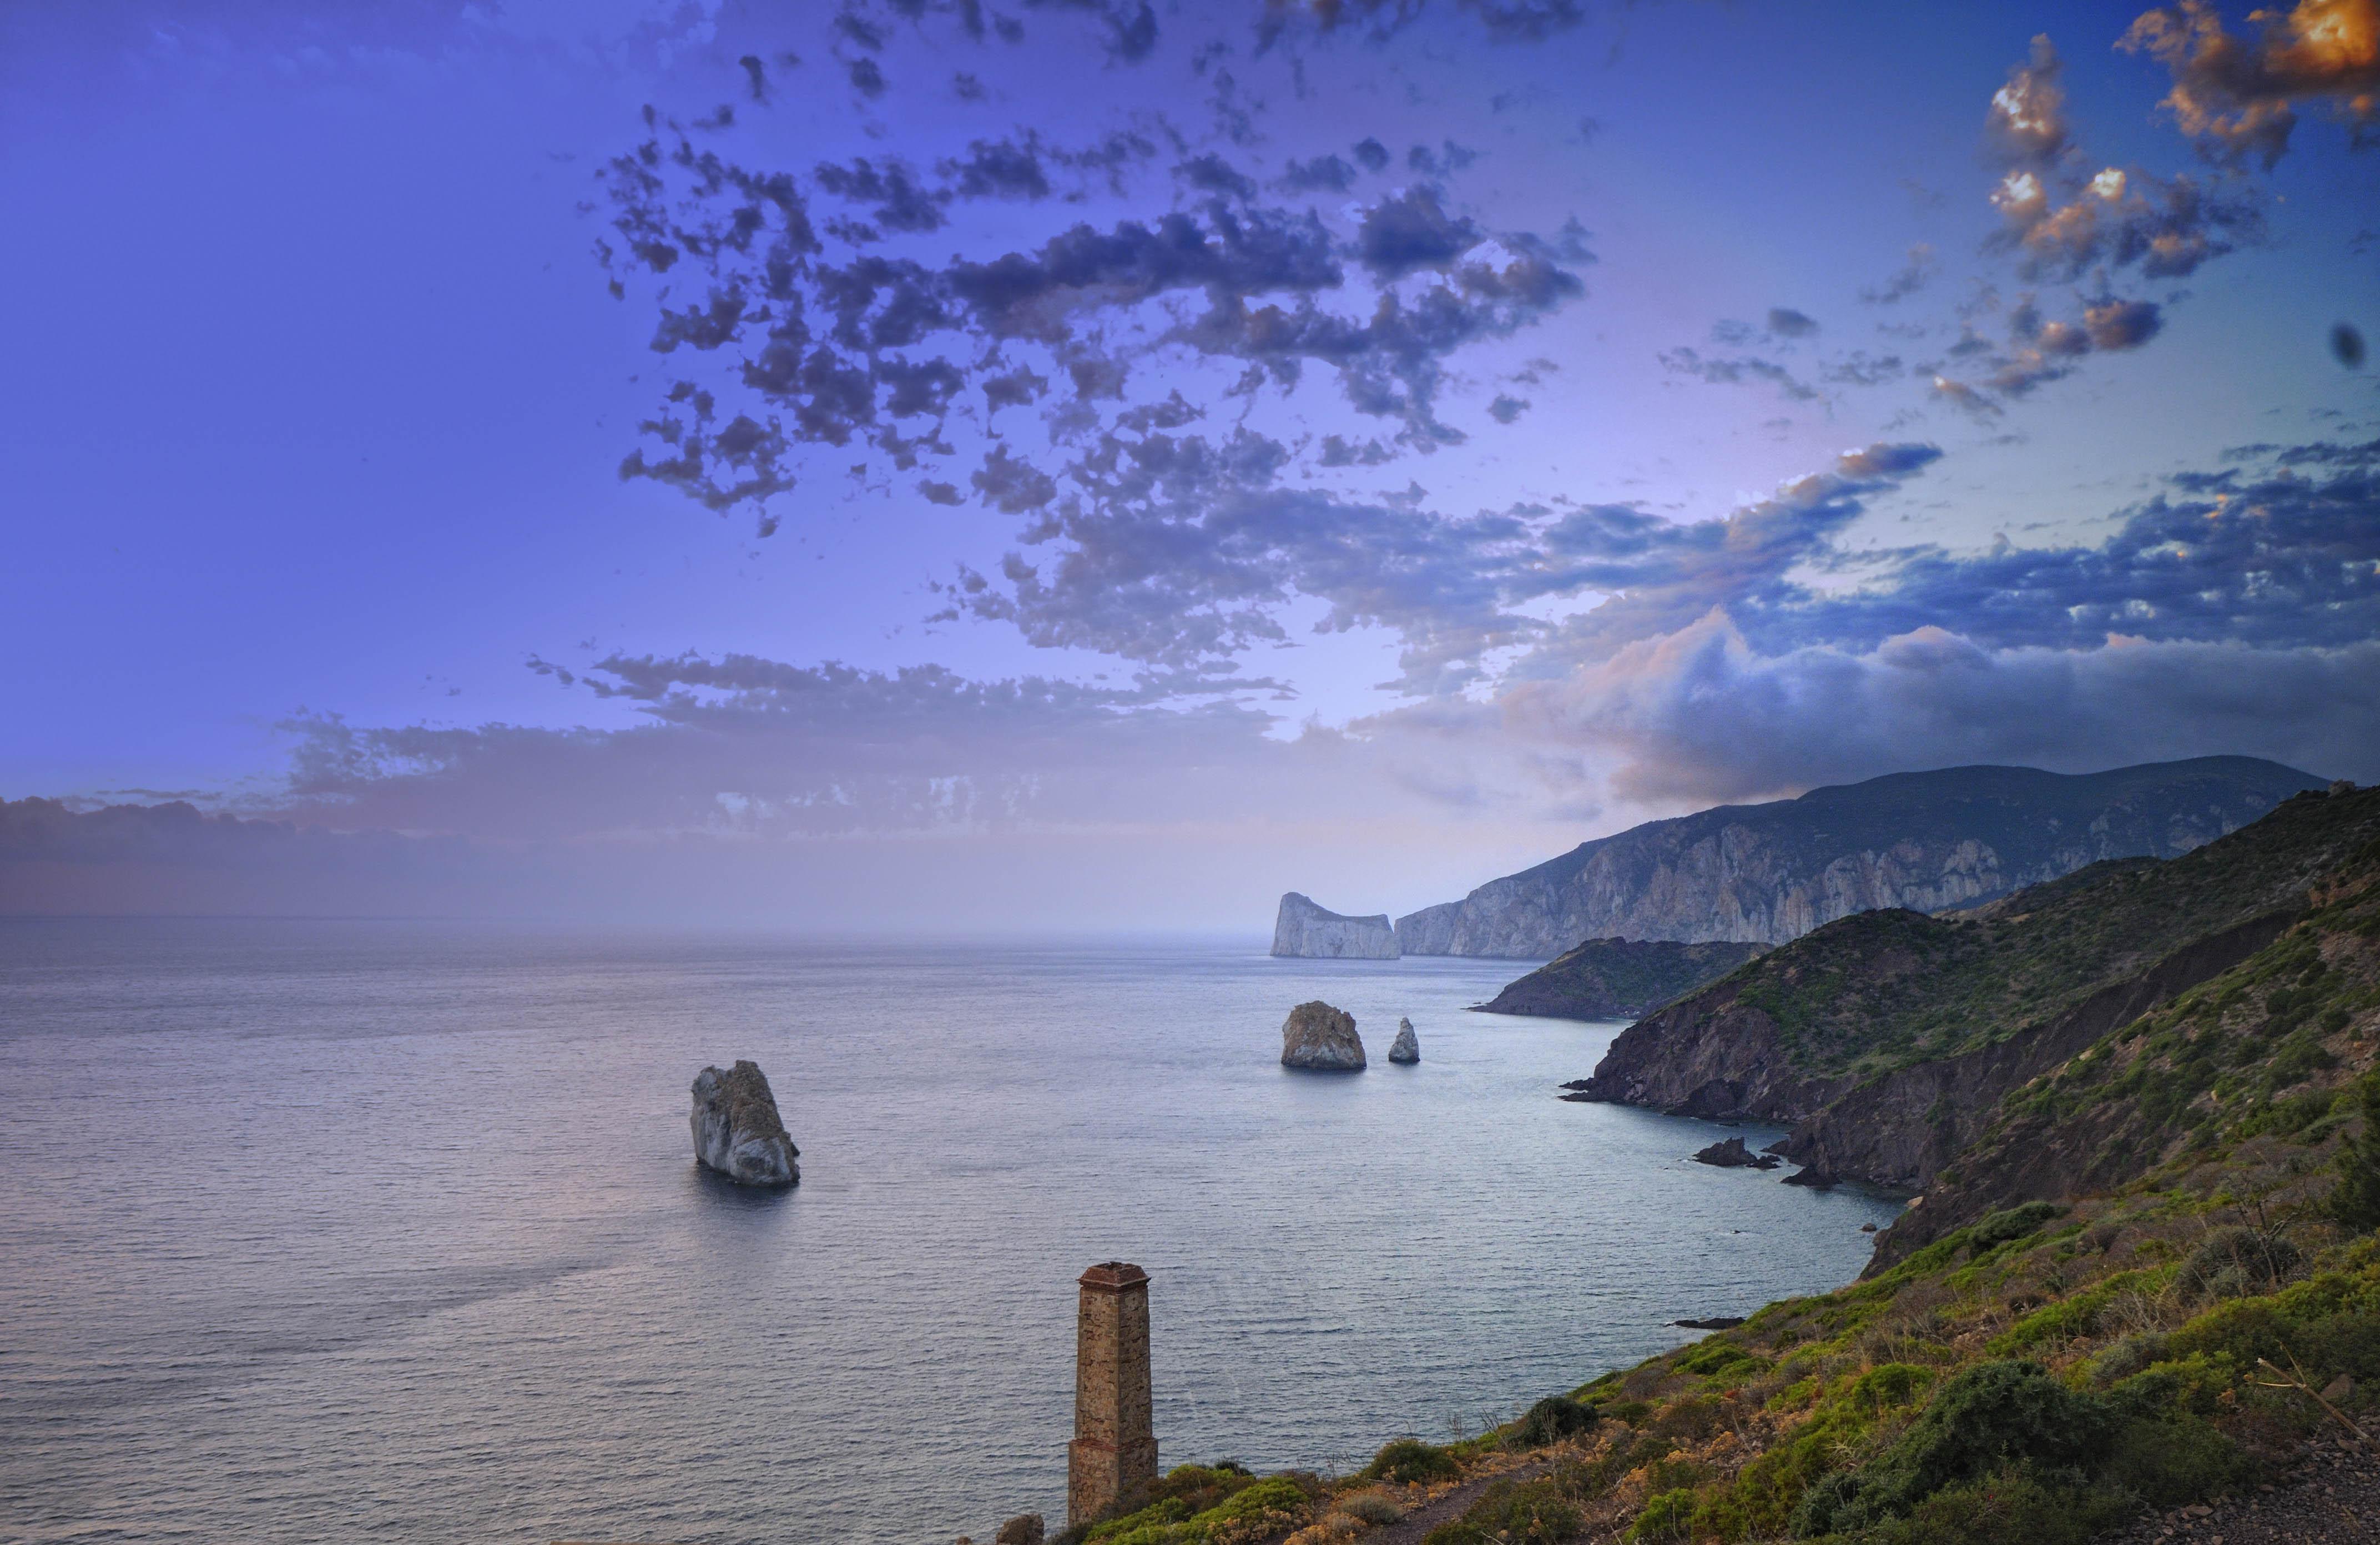 Sfondi Italia Sardegna Costa Acqua Isola Panorama Paesaggio